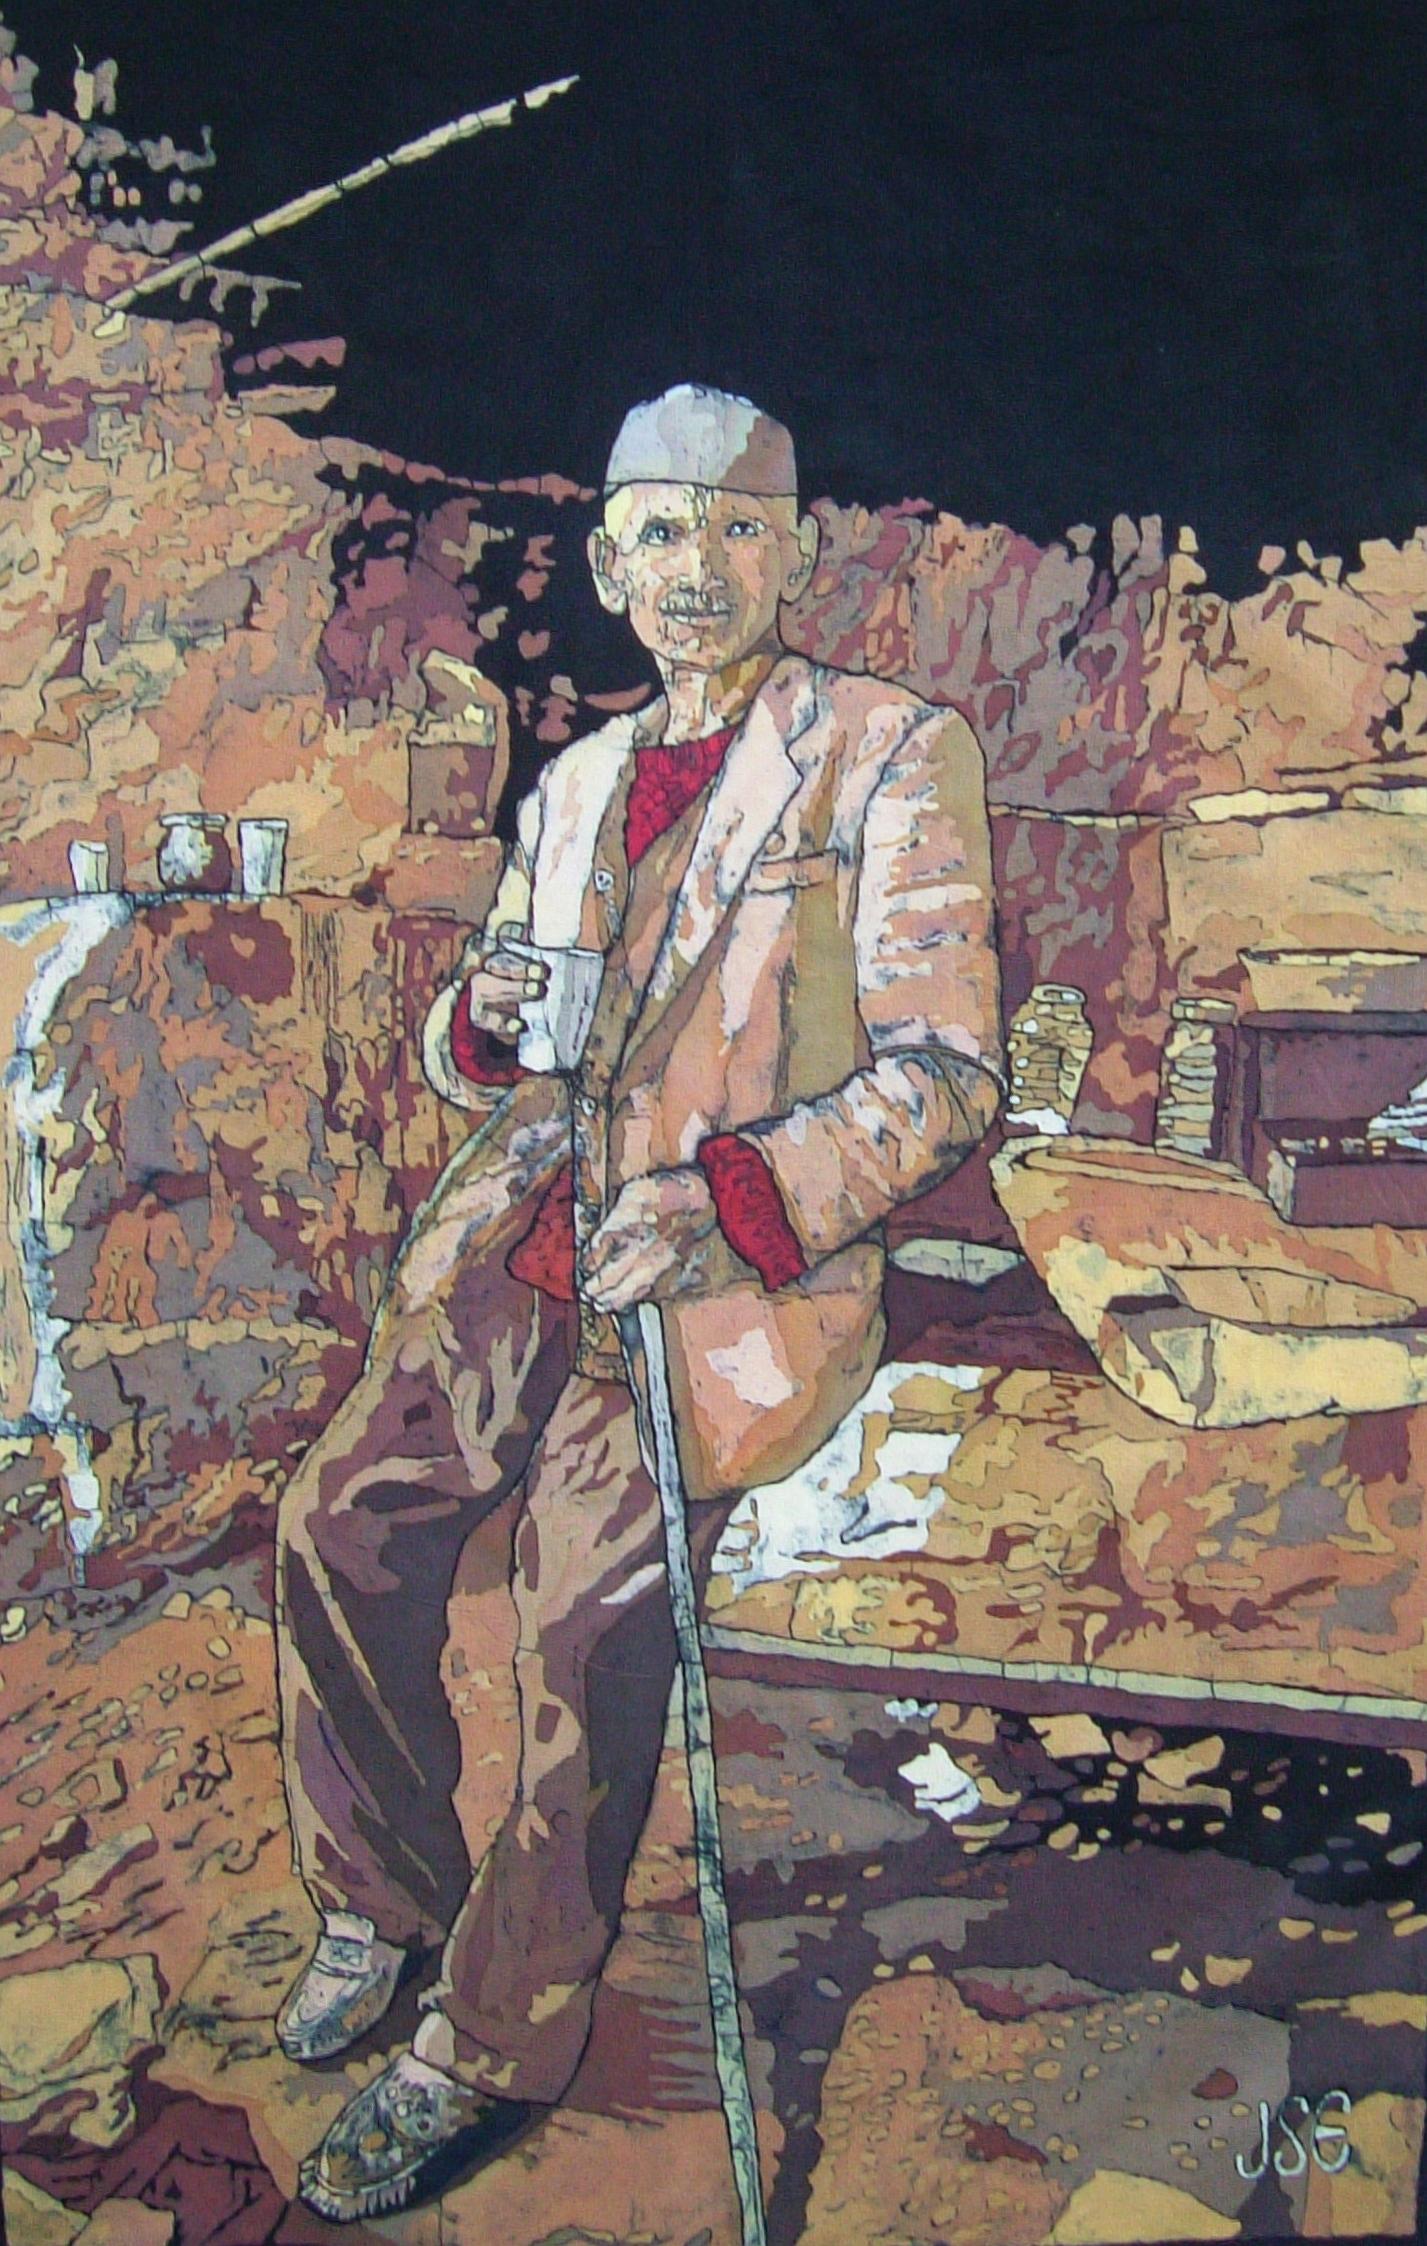 Man in Sepia